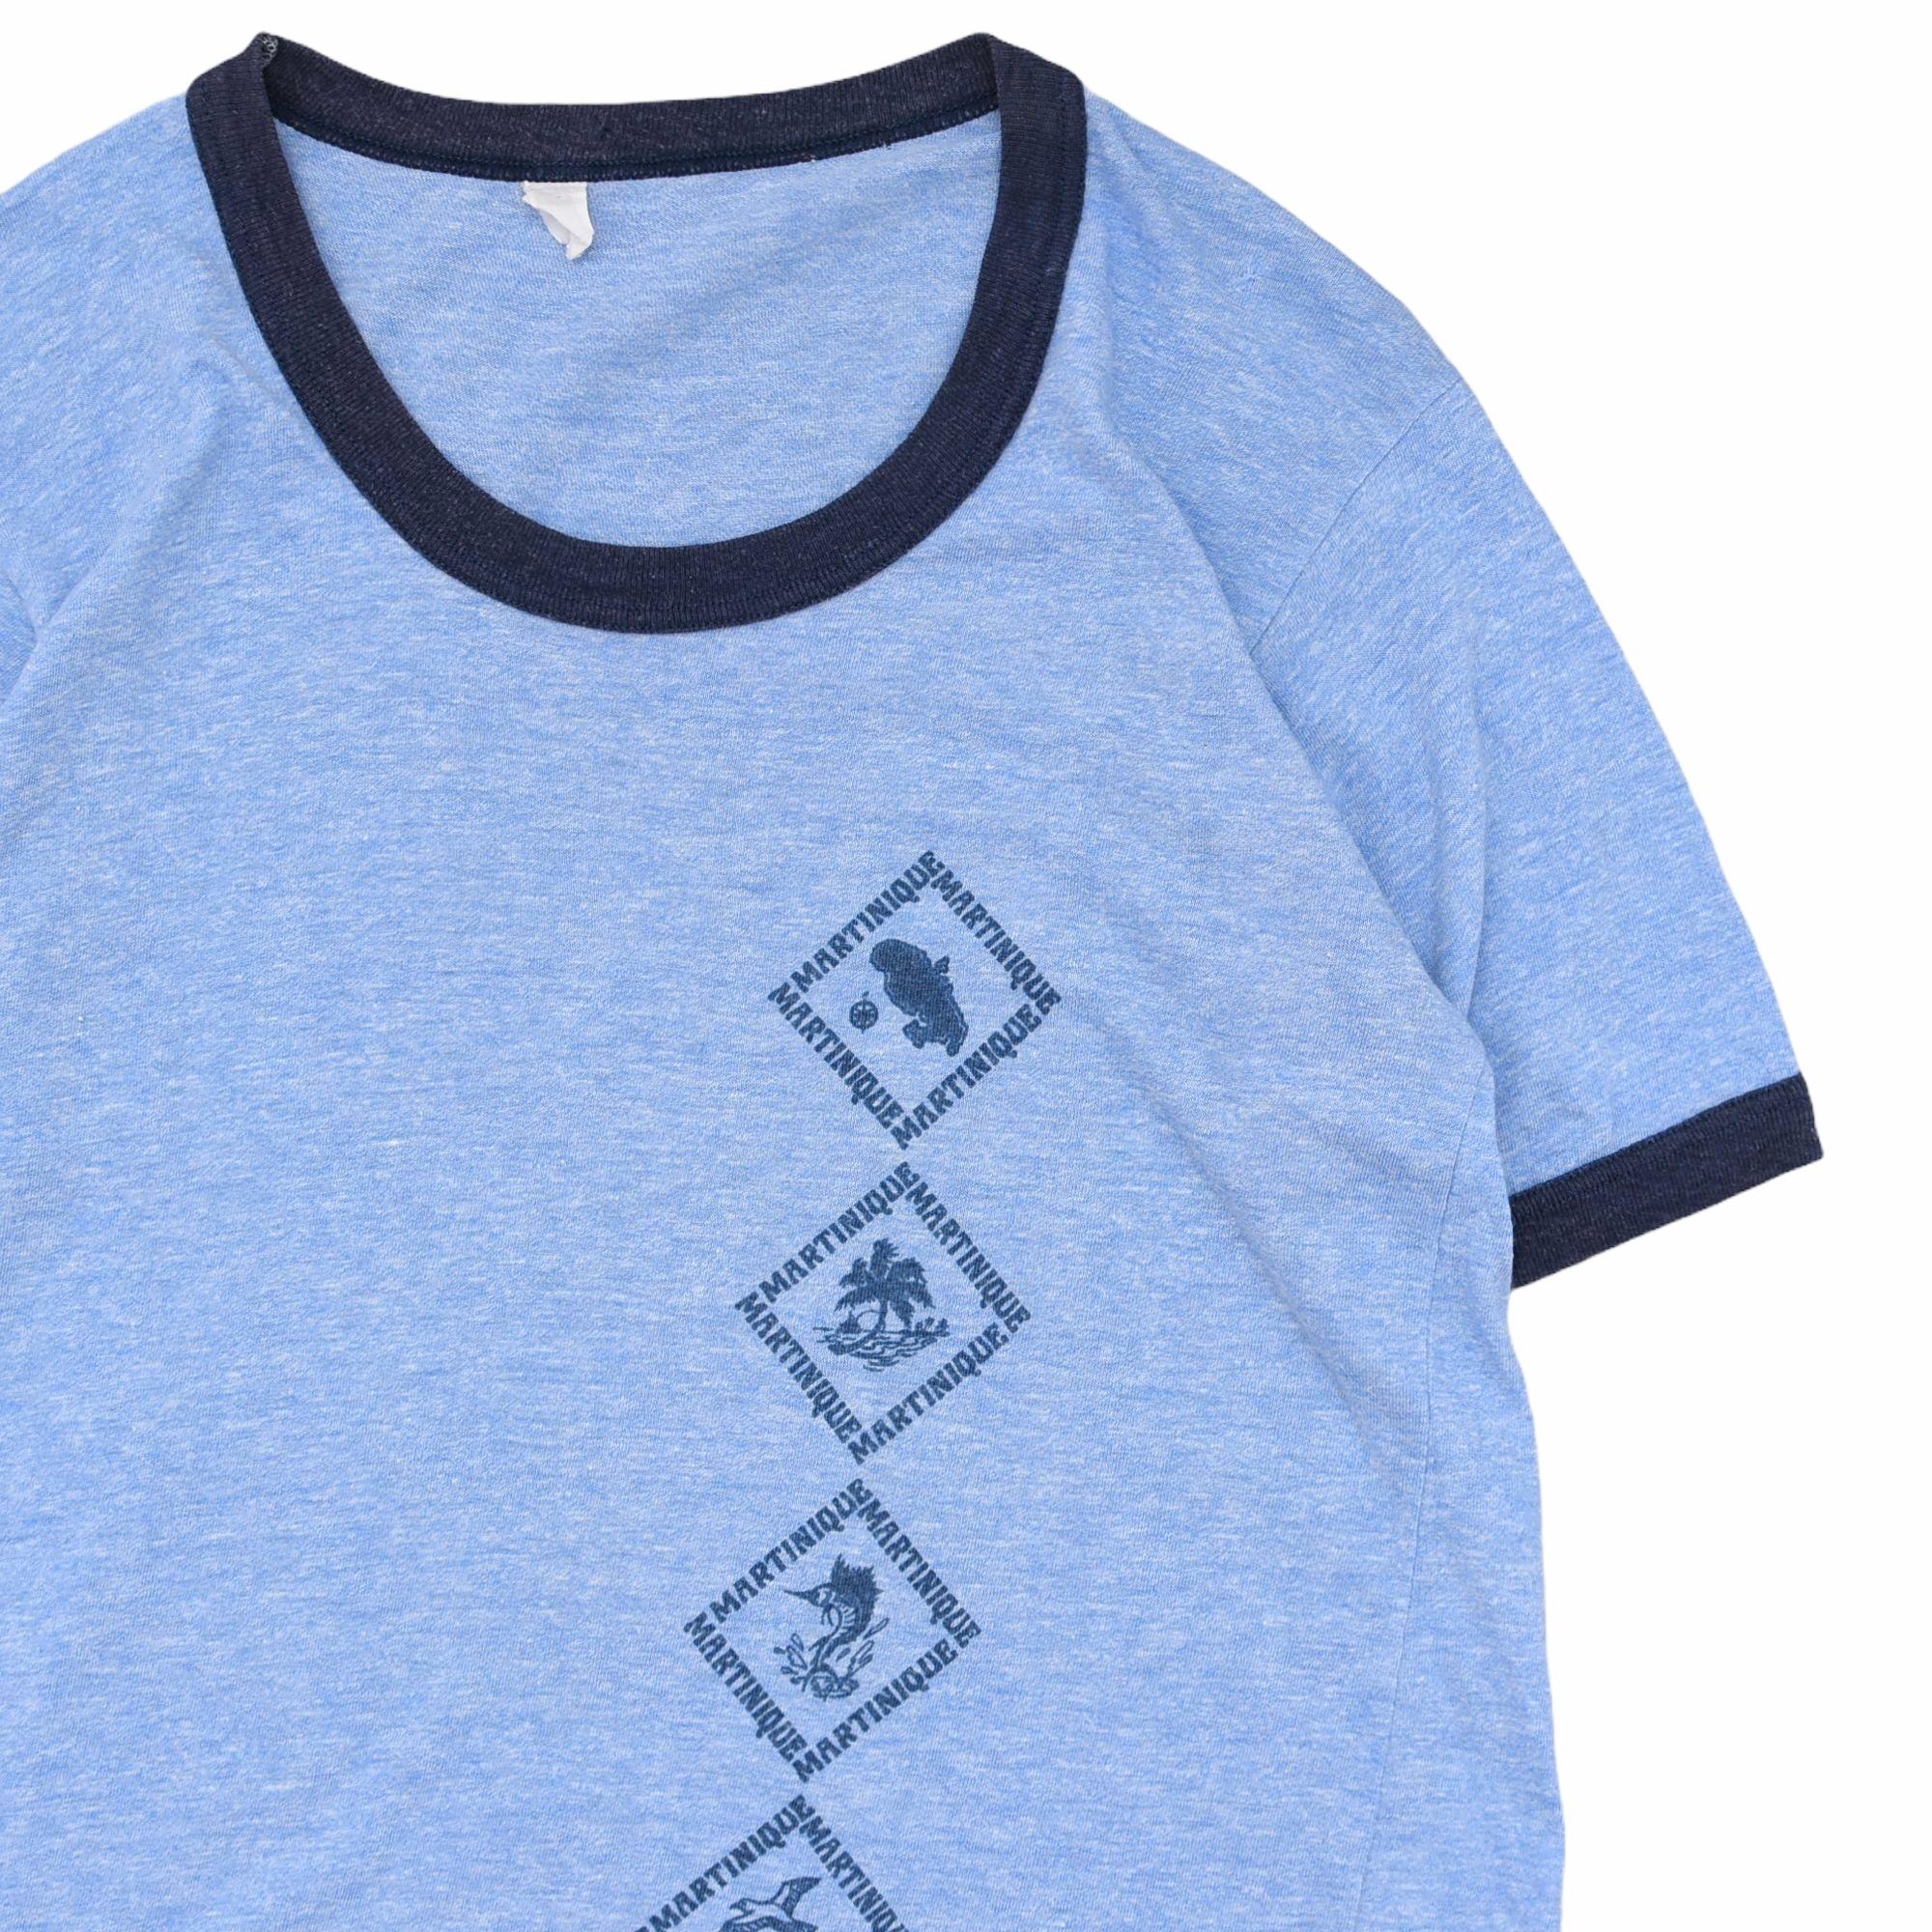 Eur vtg MARTINQUE print ringer T-shirt